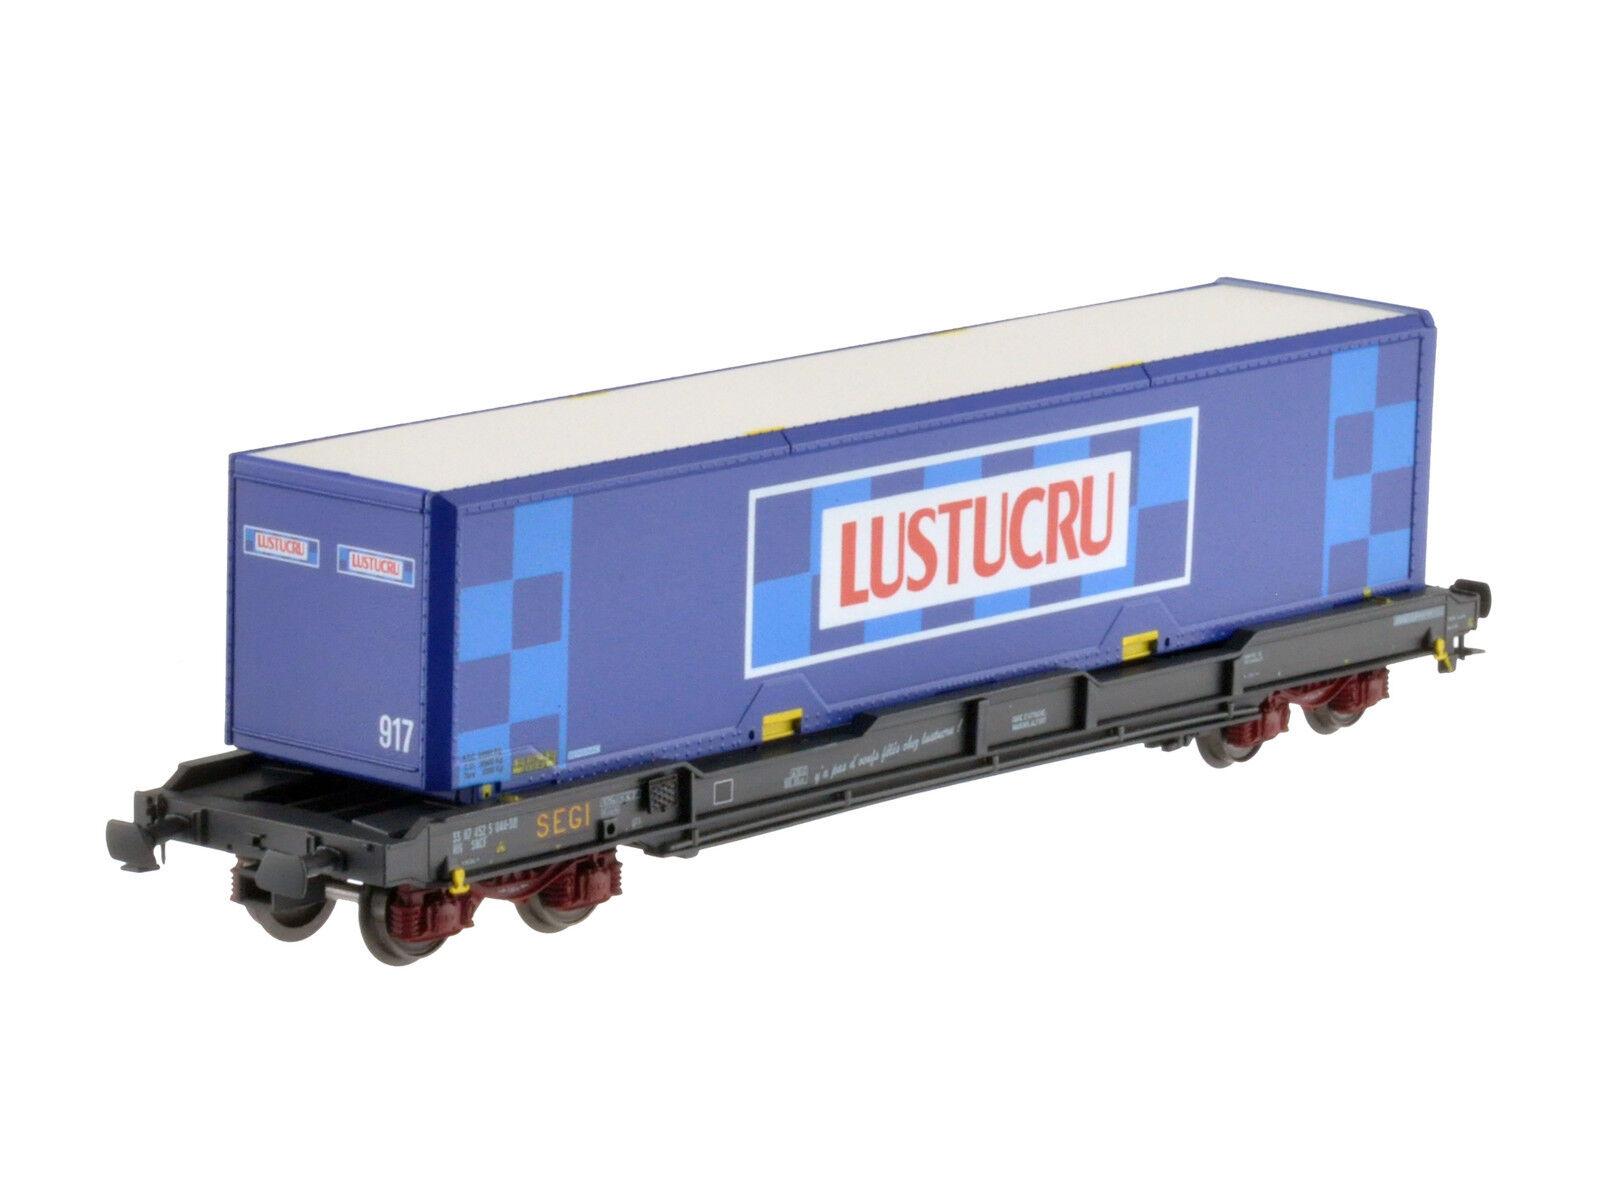 LS Models 30317 SNCF 4 ACH containertragwg Ku SEGI 40' Lustrucu ep5 NUOVO + OVP